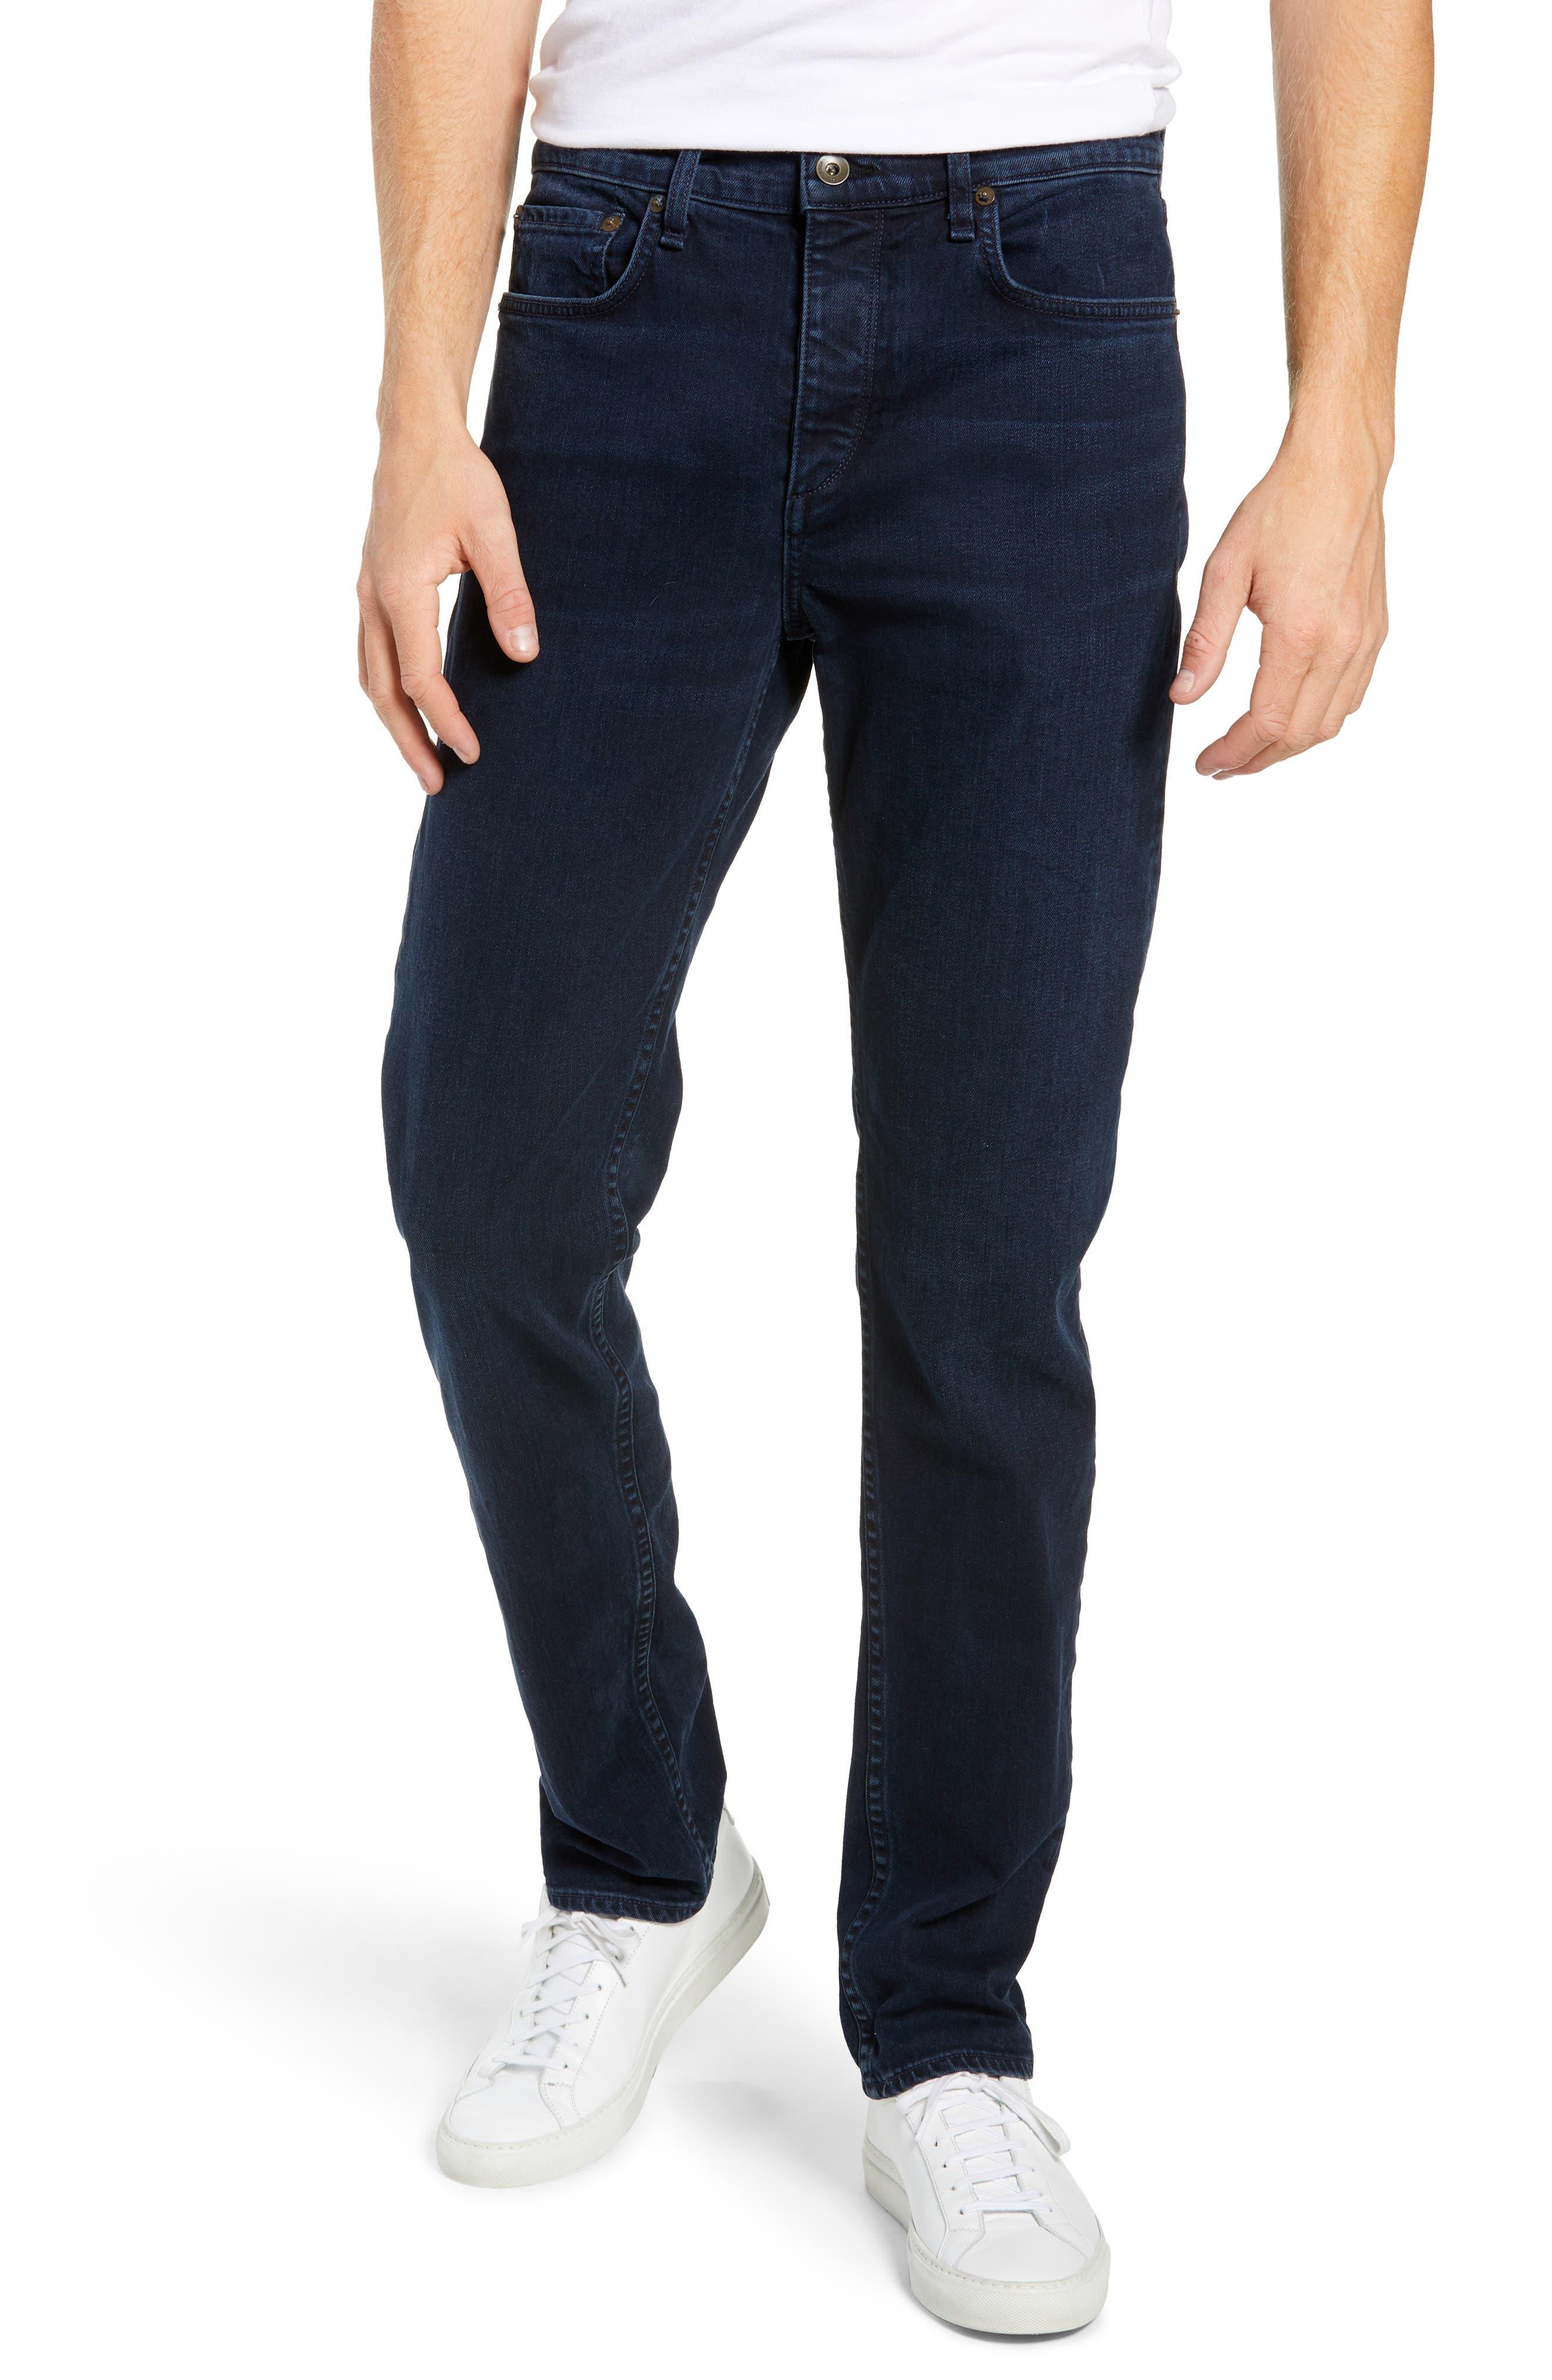 RAG & BONE, Fit 2 Slim Fit Jeans, Main thumbnail 1, color, BAYVIEW